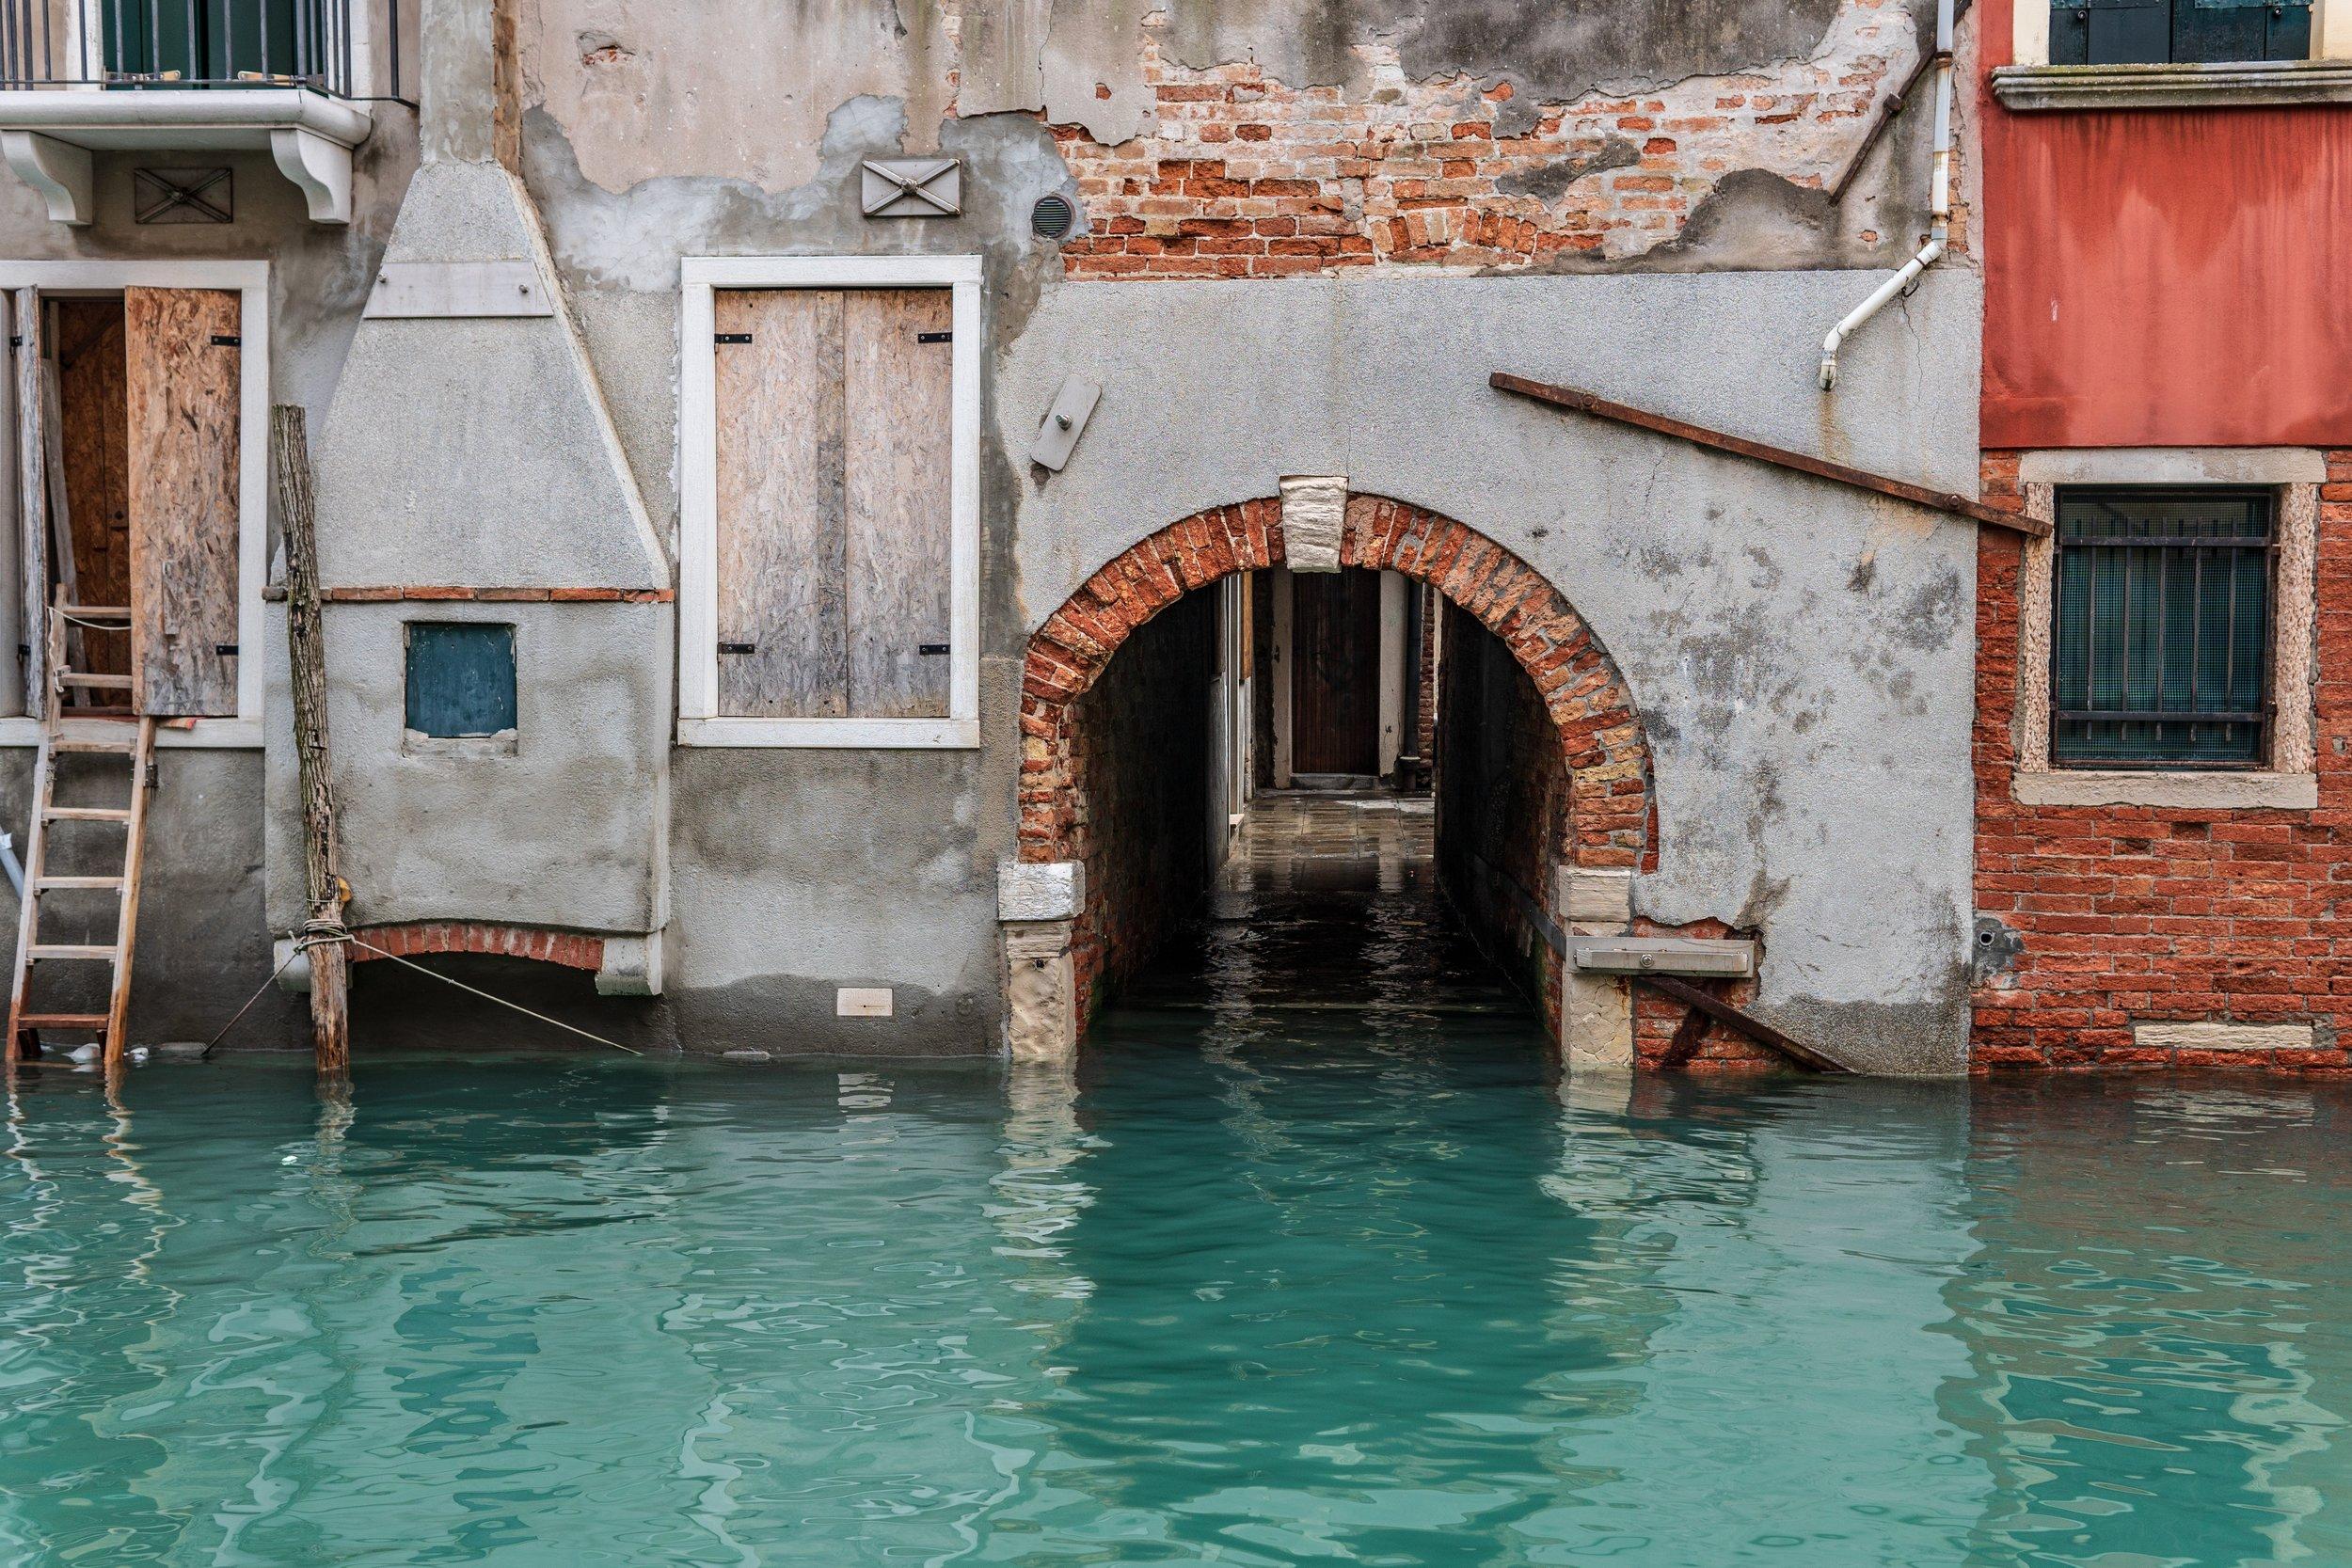 Flood Insurance -